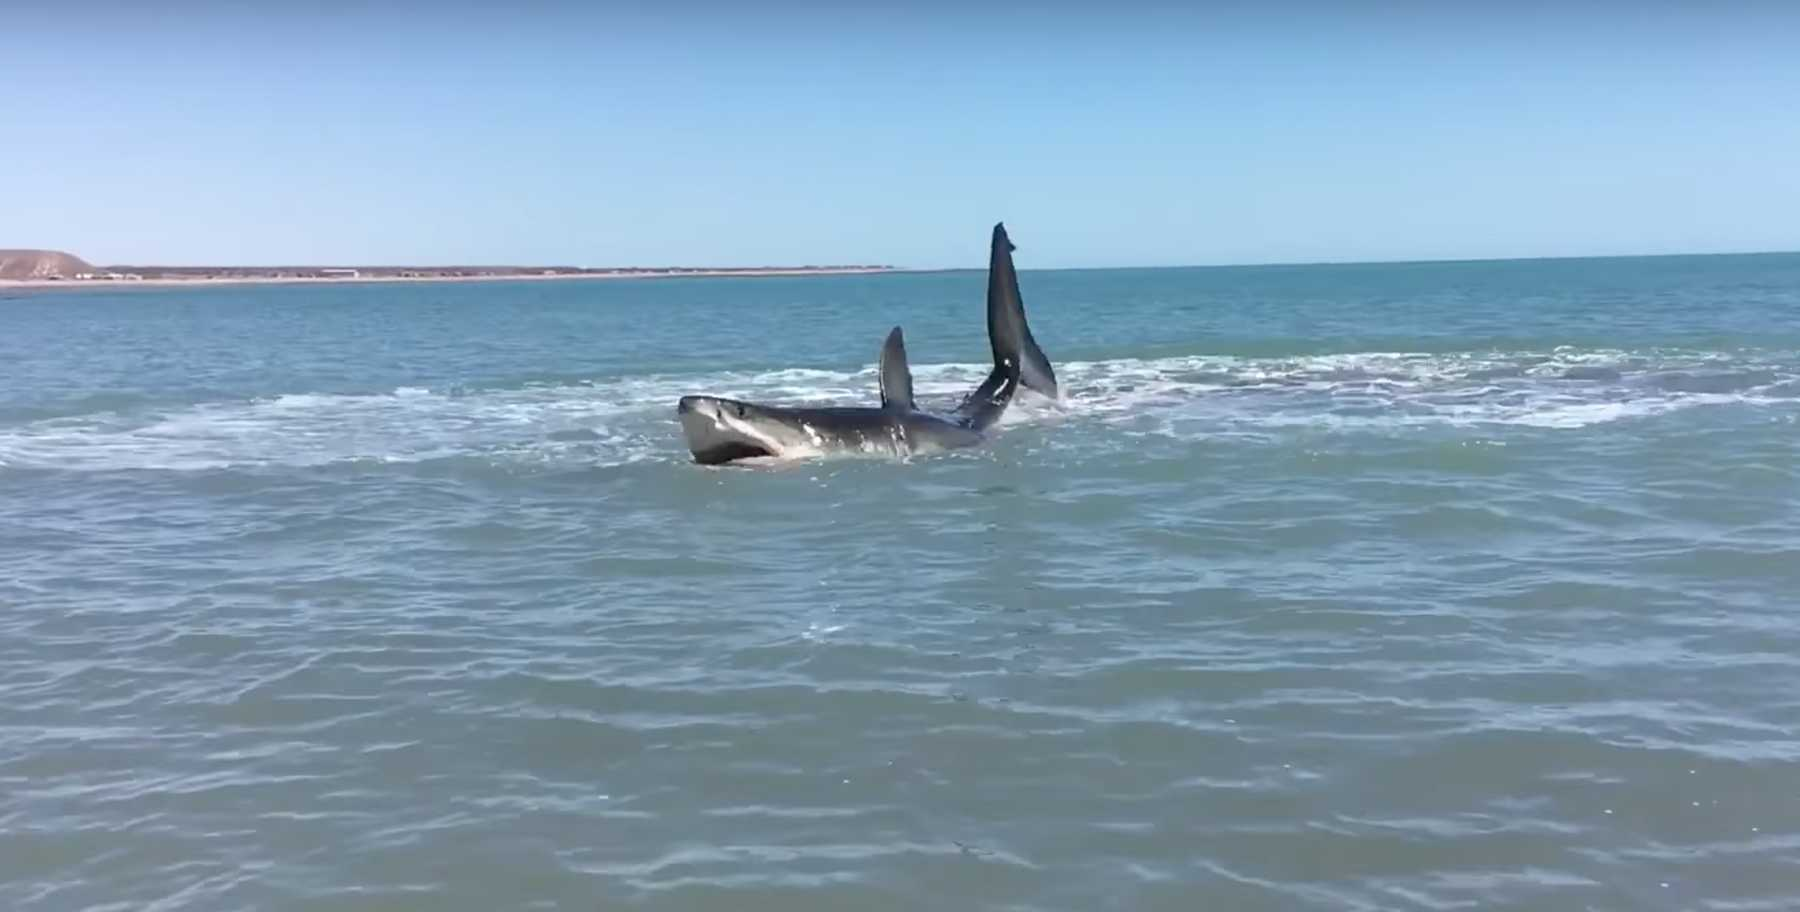 Man Films Injured Shark Off Baja Coast | Shark